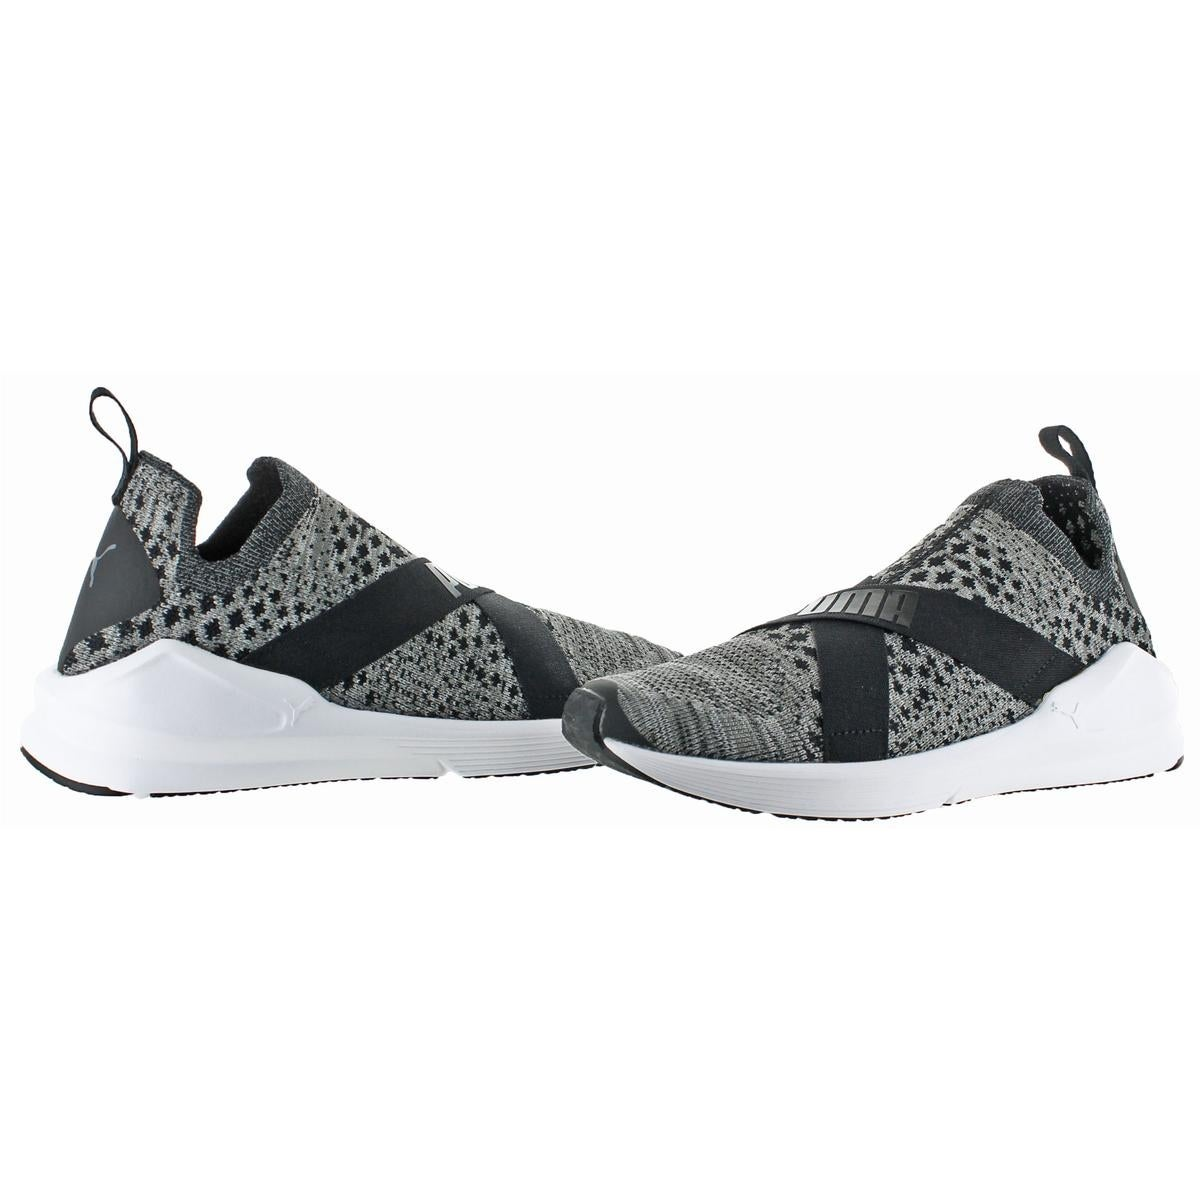 Shop Puma Womens Fierce evoKNIT Fashion Sneakers Round Toe Casual ... 6190ccf80